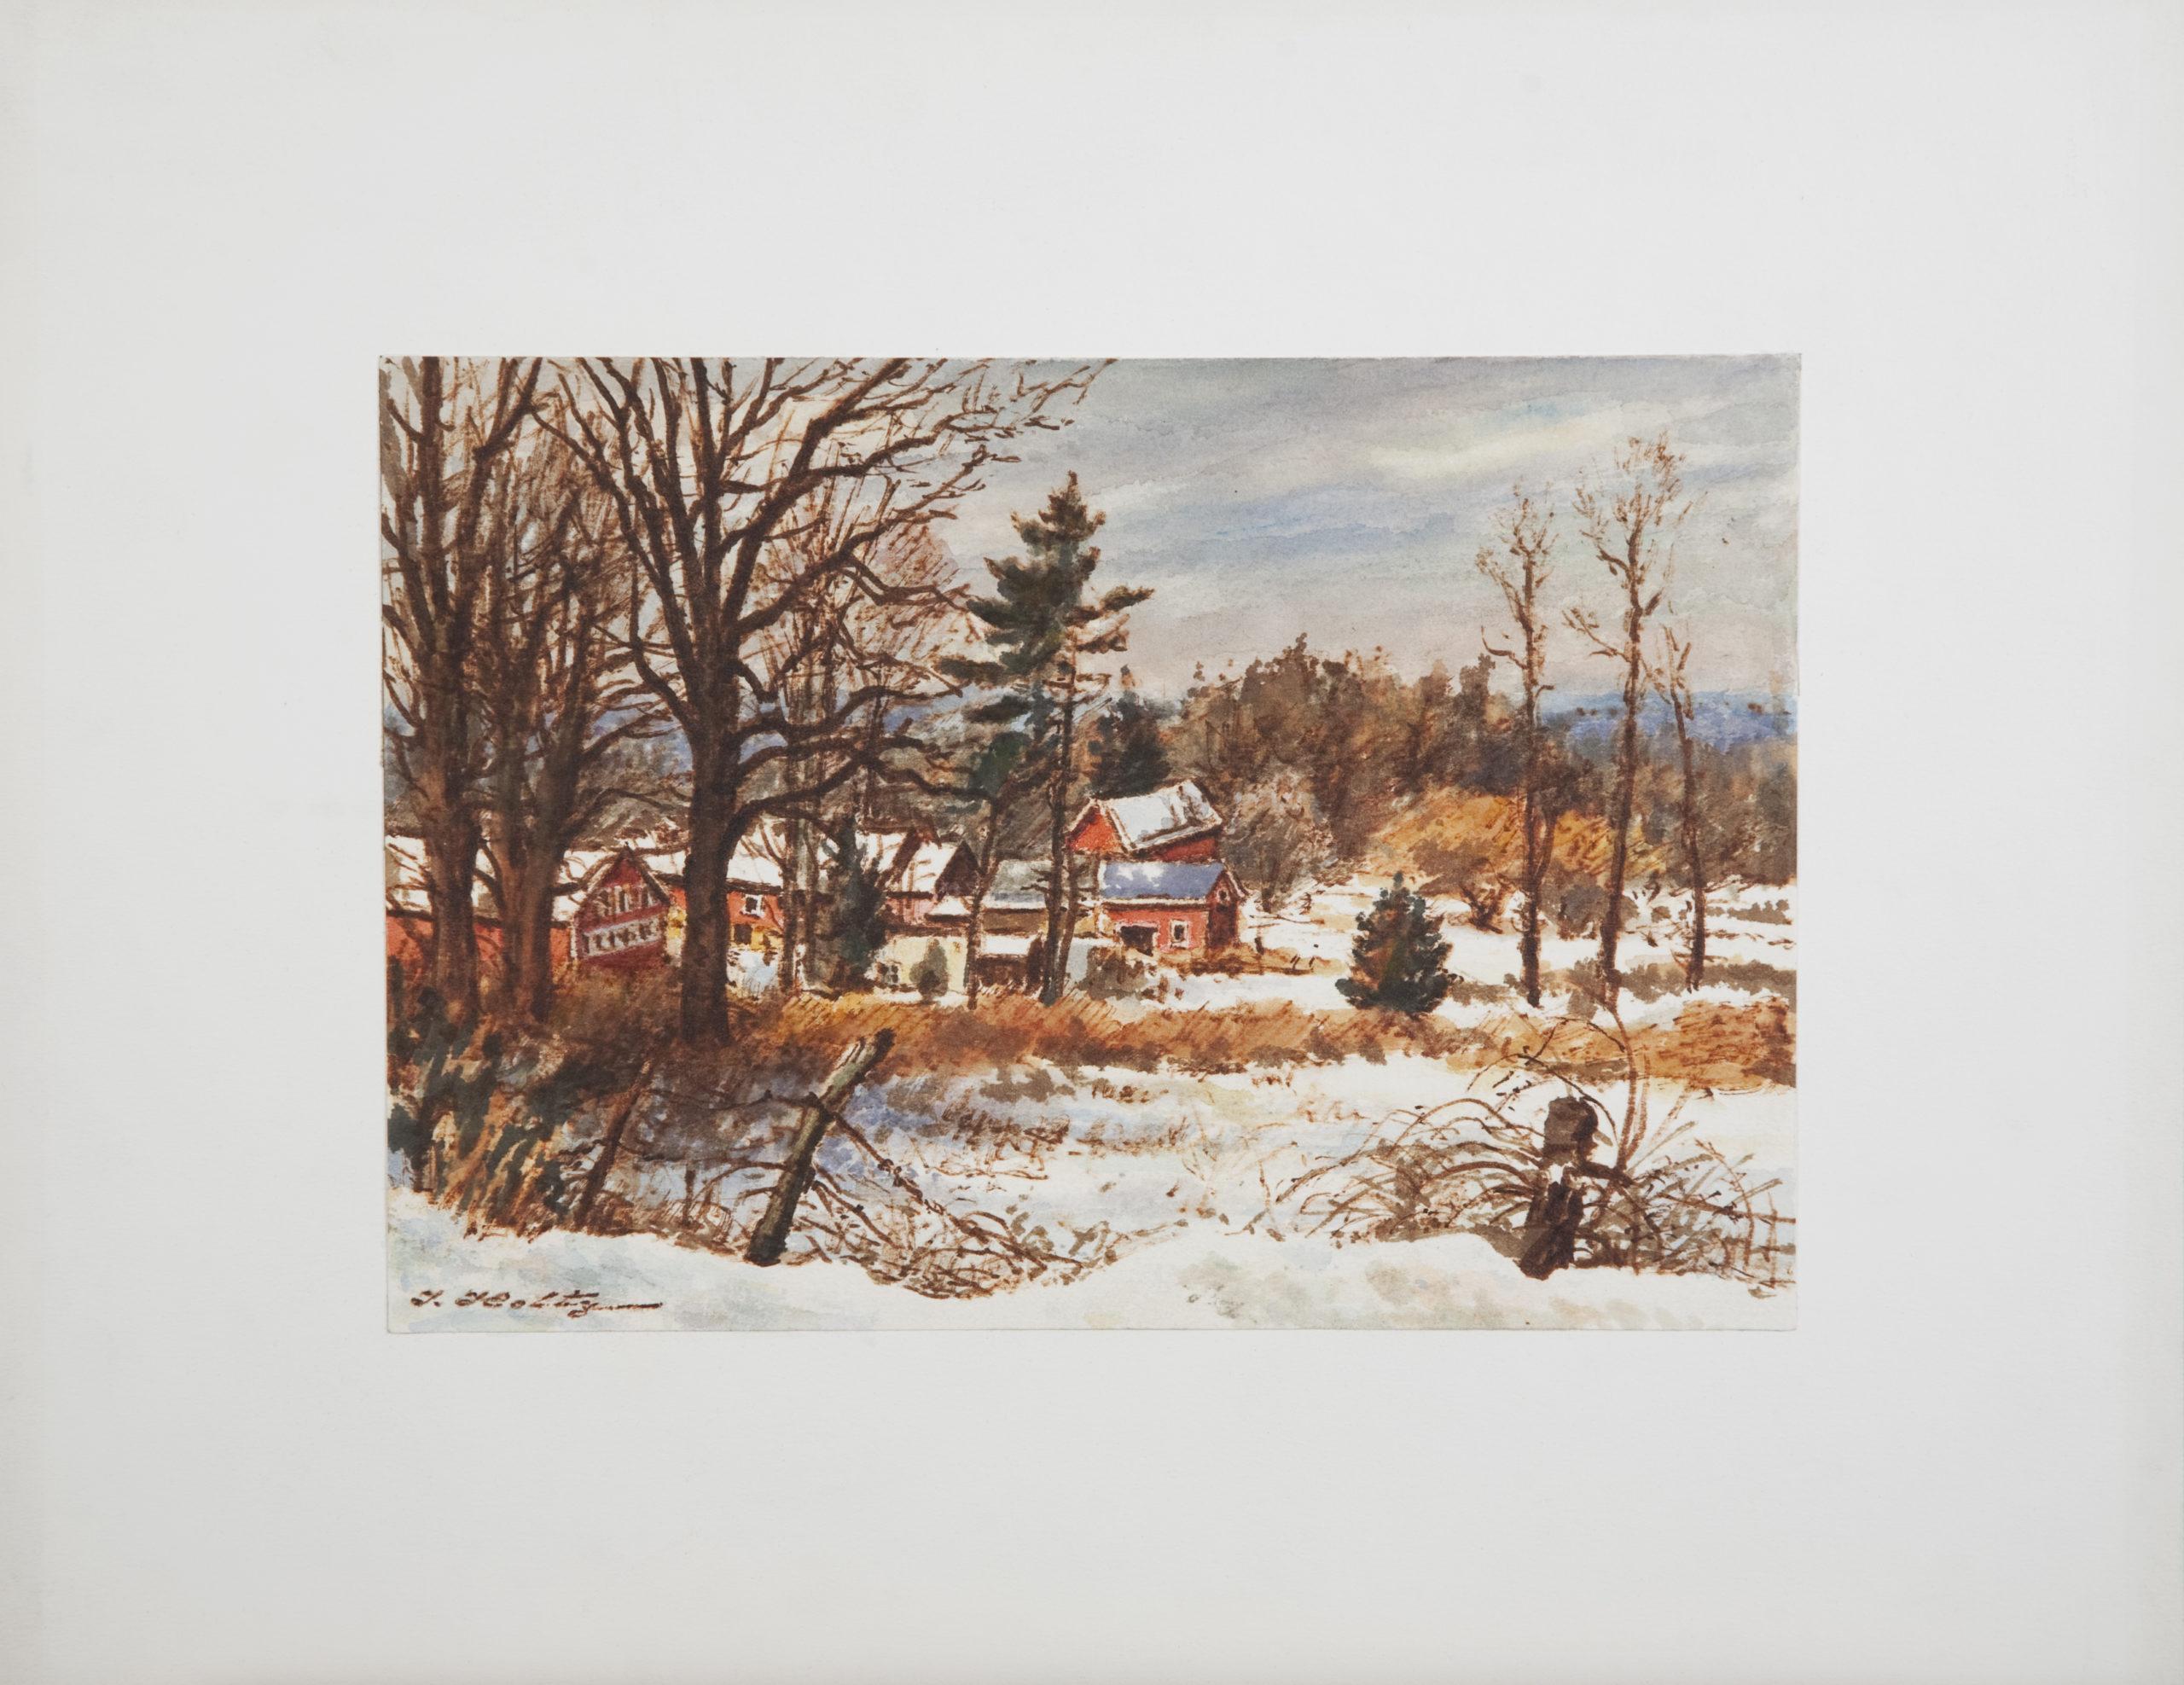 D39 Country Scene in Winter - Colored Marker - 10 x 7 - Matt: 15.75 x 12.5 - No Frame